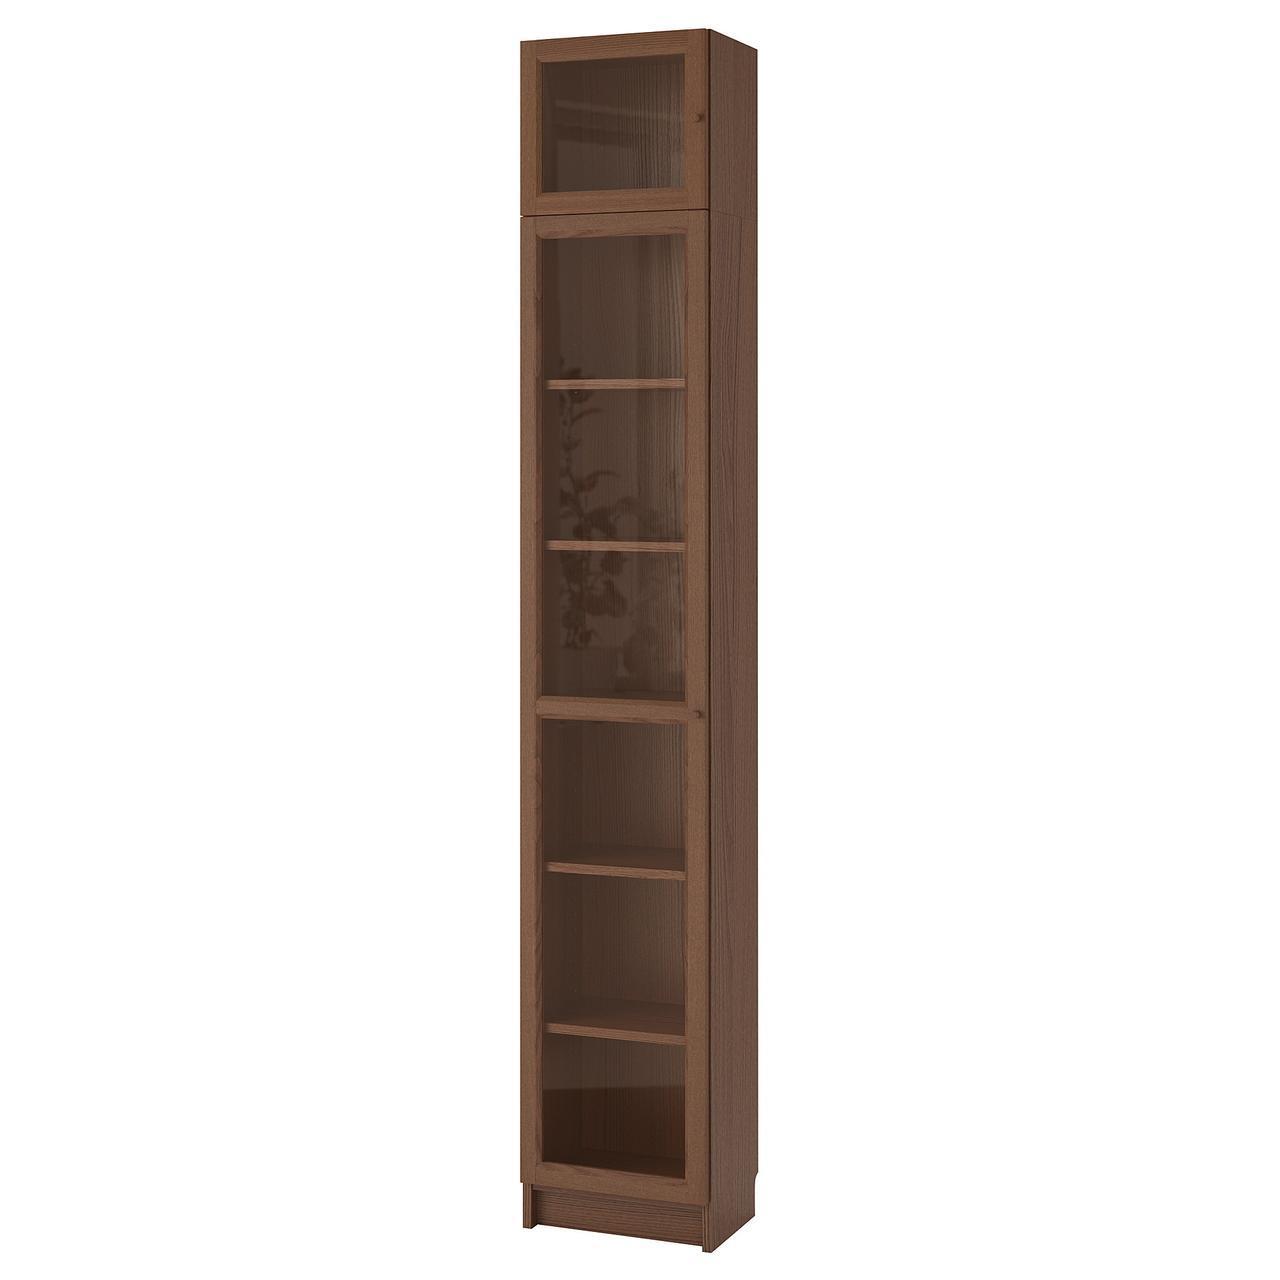 IKEA BILLY/OXBERG Книжный шкаф, коричневый Шпон ясеня, стекло  (992.874.37)